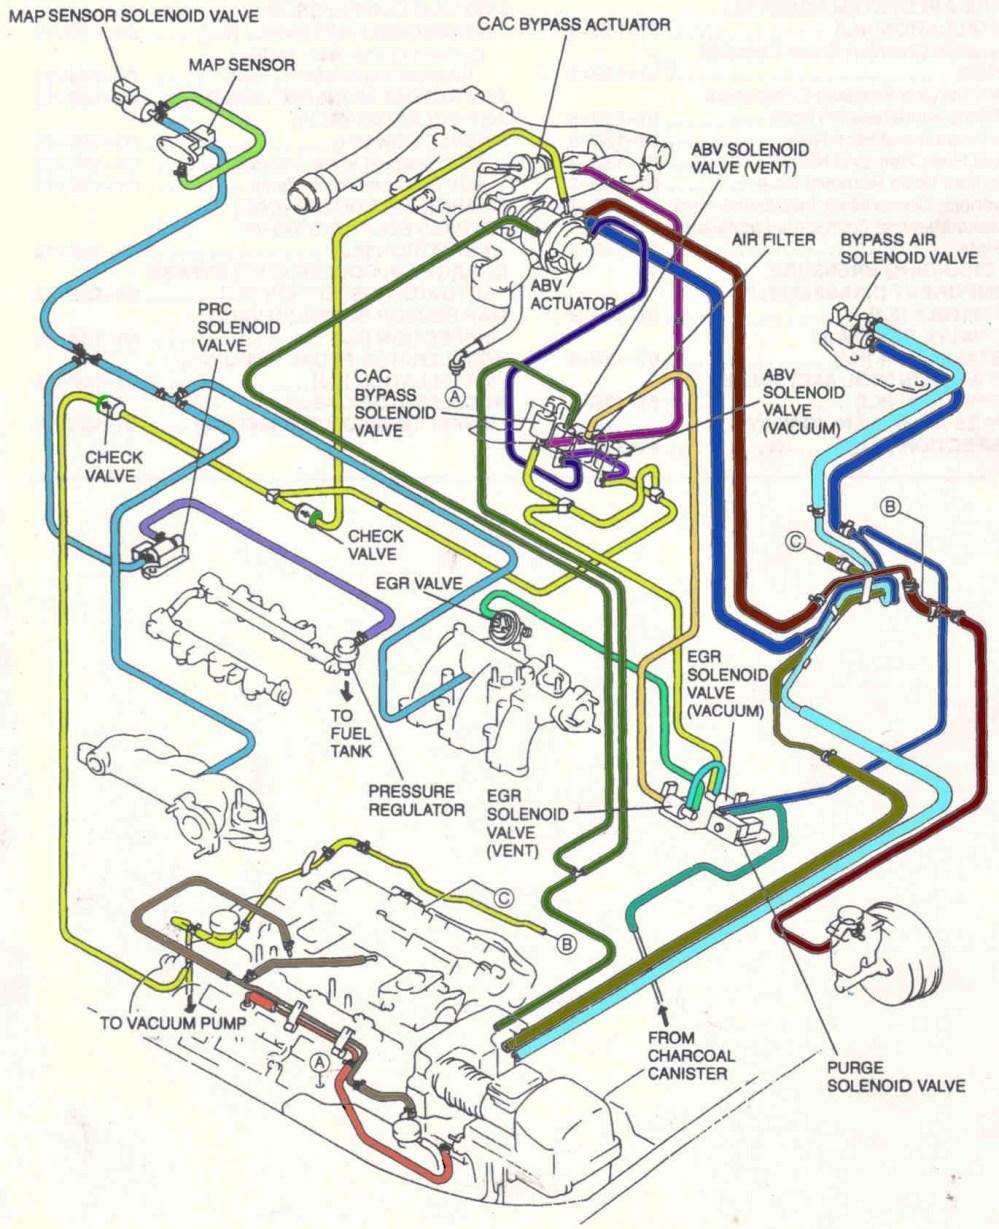 medium resolution of 1993 mazda 626 engine diagram wiring library rh 13 dirtytalk camgirls de 2001 mazda millenia engine diagram belt 2004 mazda 3 engine diagram